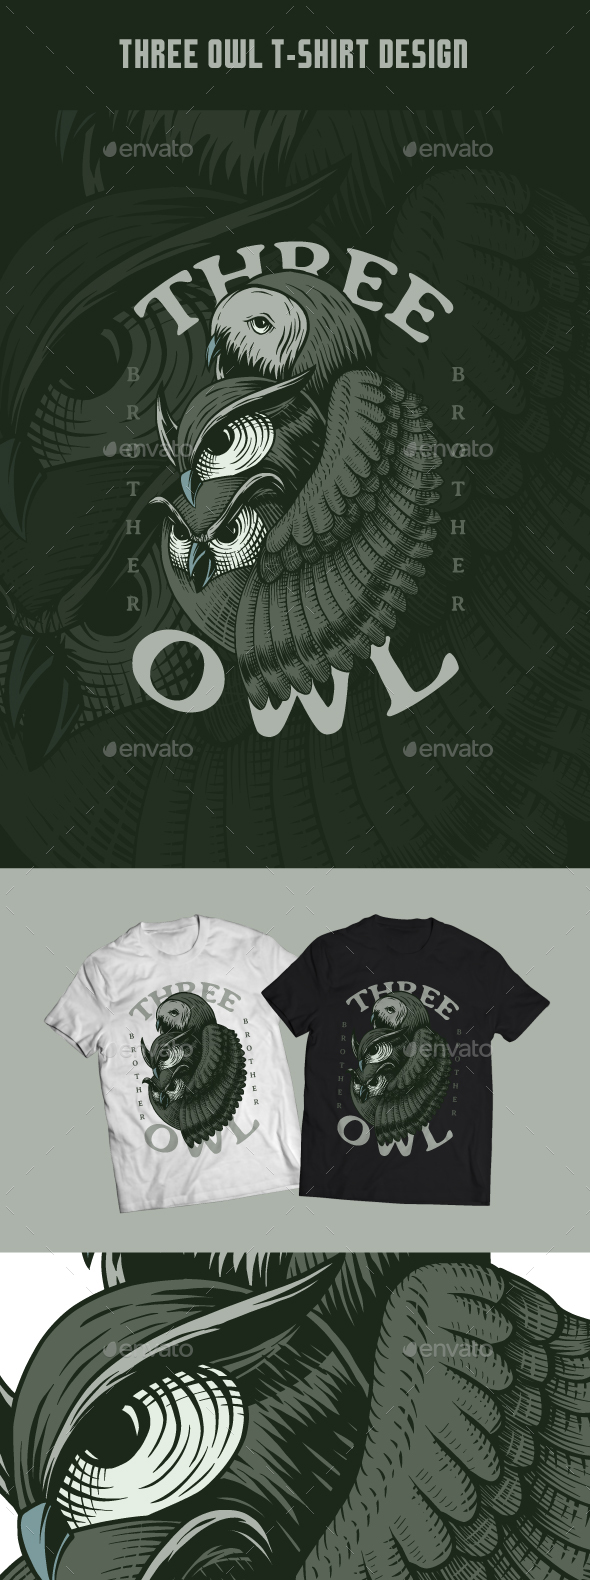 Three Owl T-Shirt Design